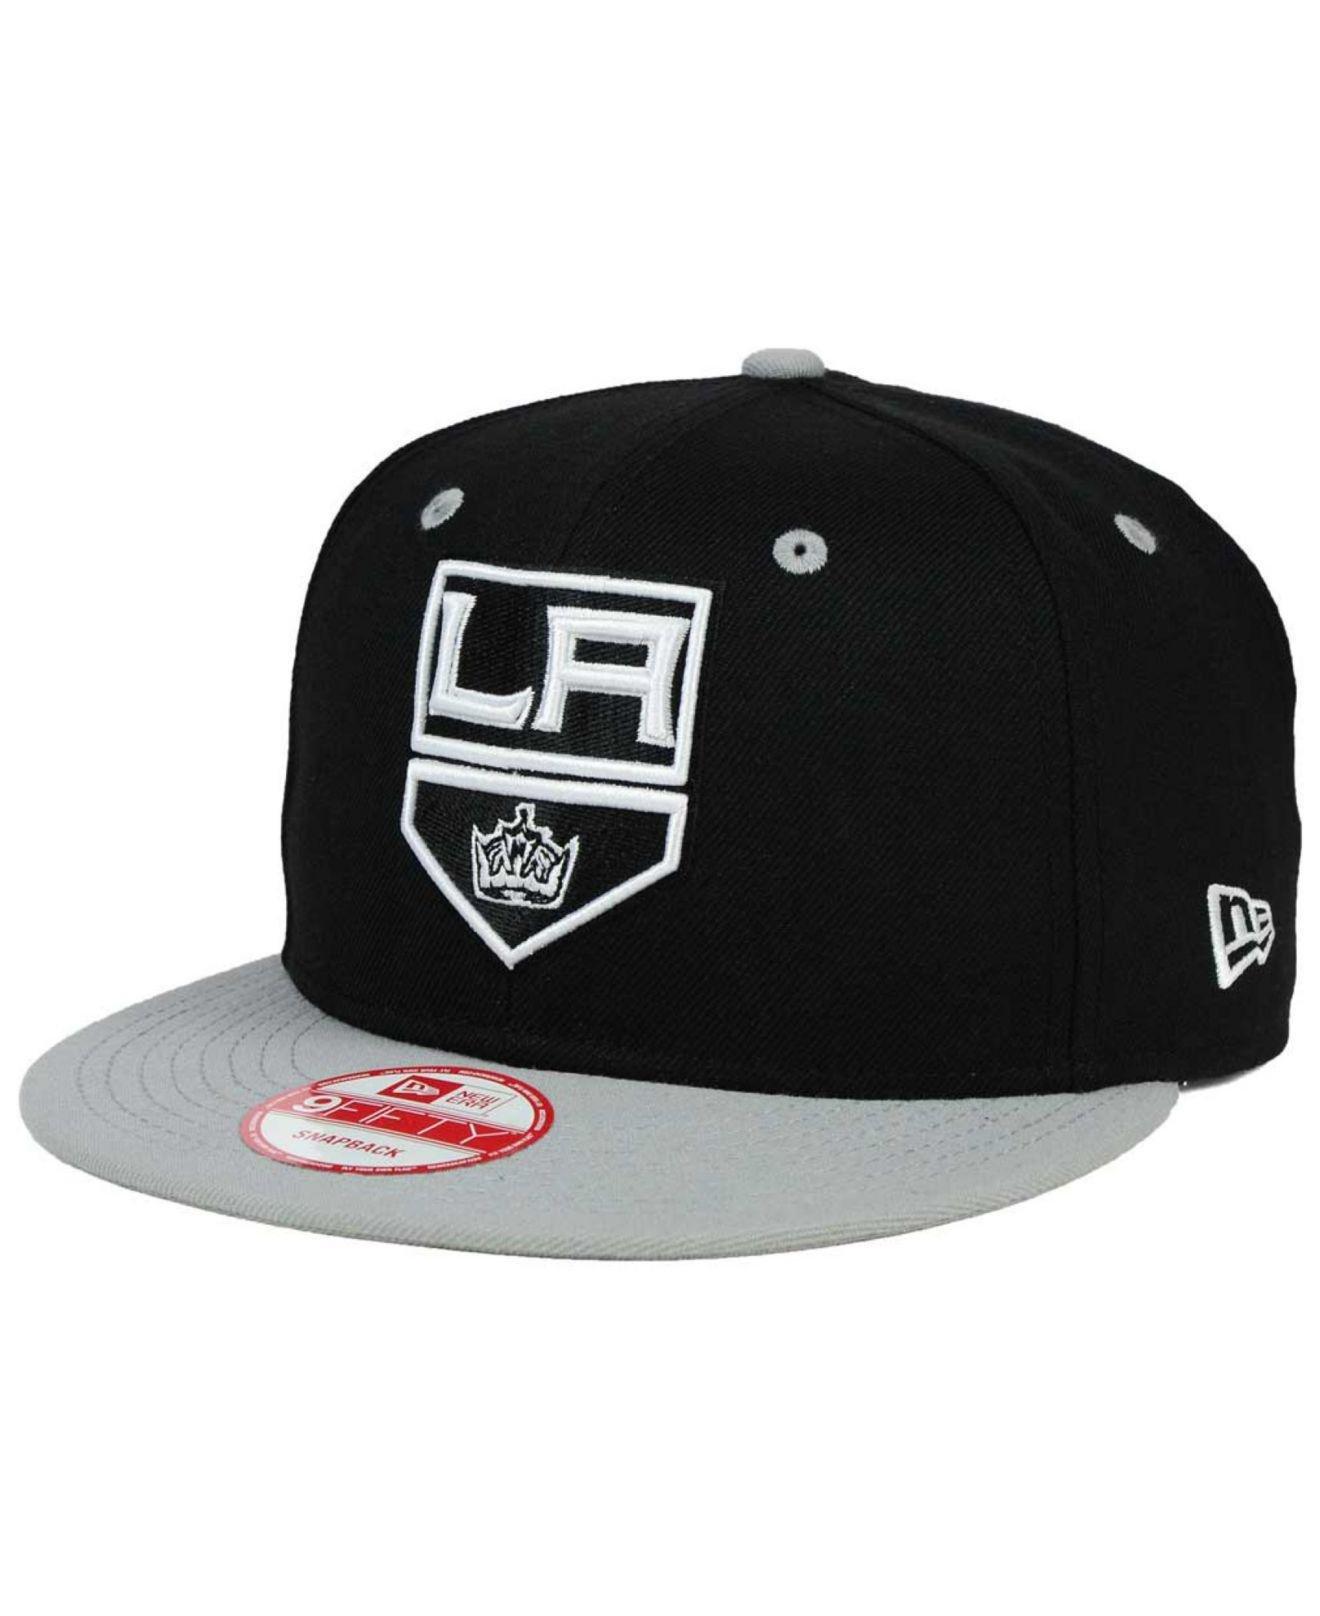 0888d5317f3 KTZ. Men s Gray Los Angeles Kings Black White Team Color 9fifty Snapback Cap